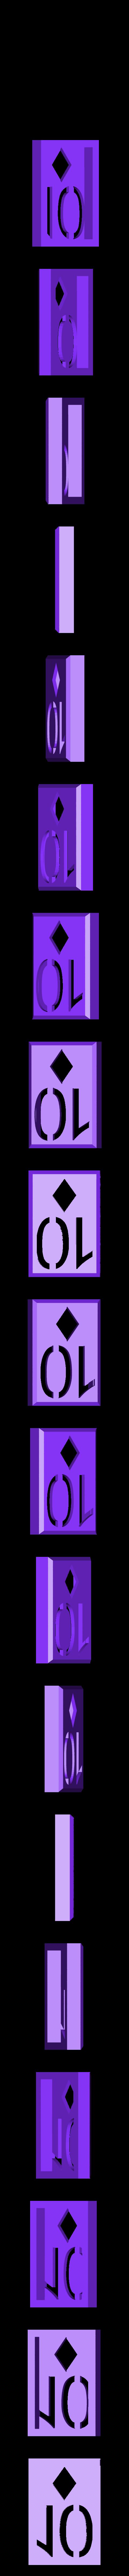 BlockDiamonds10.stl Download STL file Playing Card Tiles • Object to 3D print, Jinja